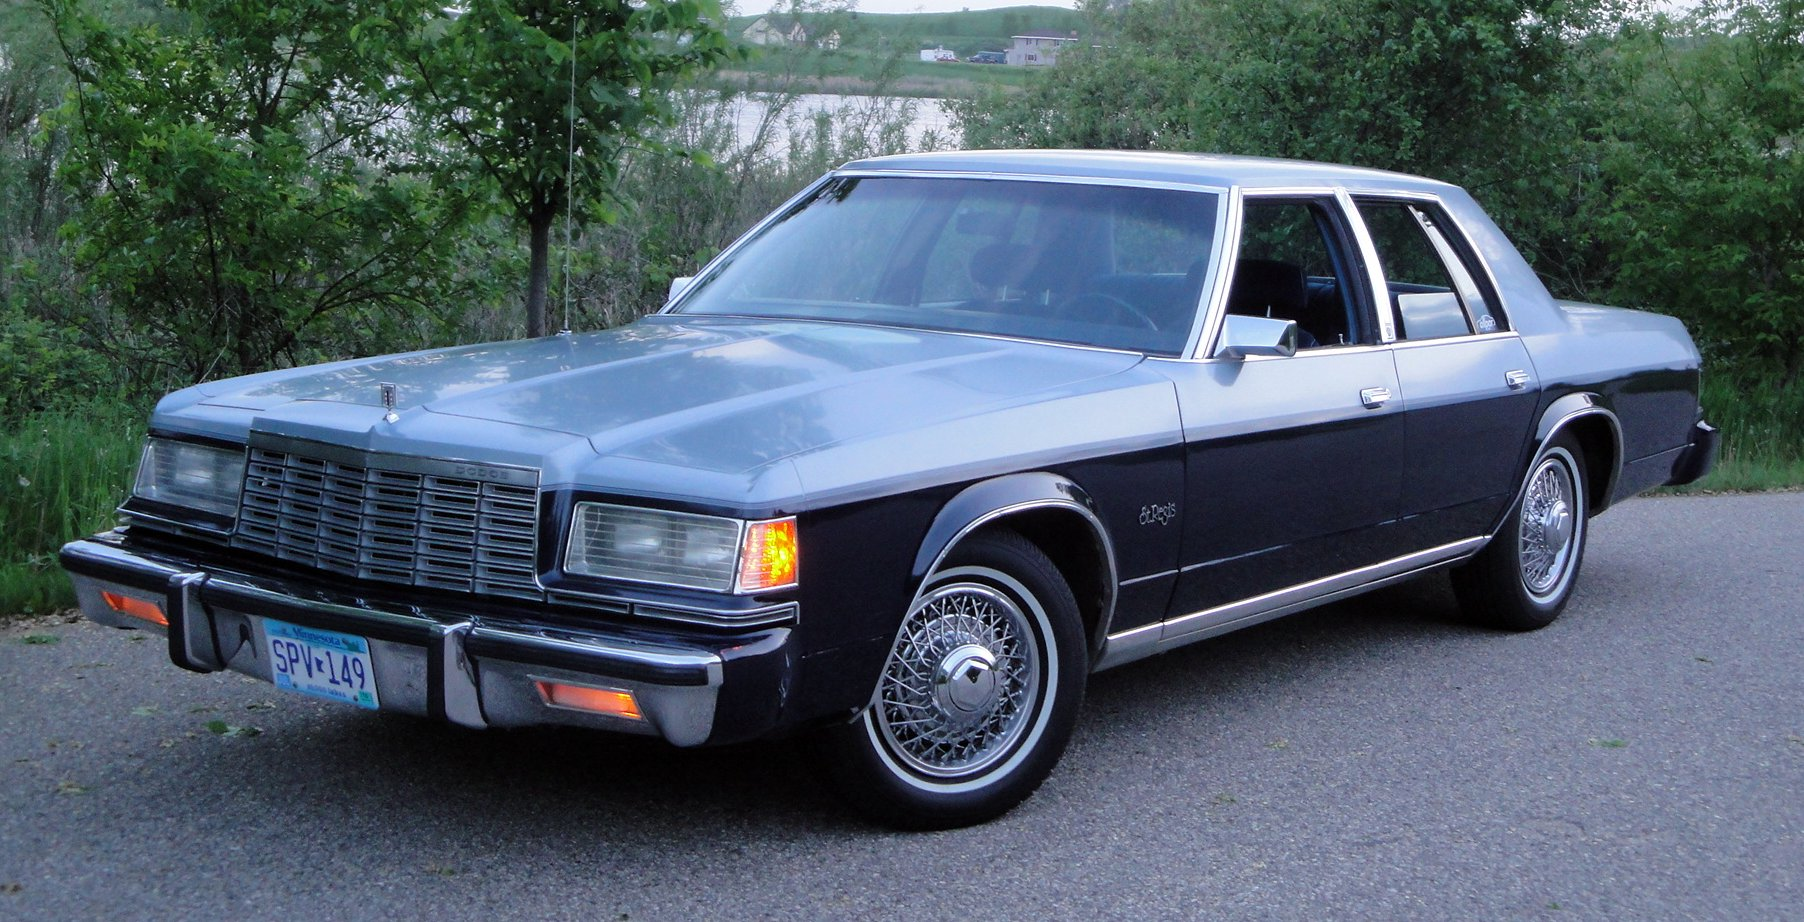 File:1980 Dodge St.Regis.jpg - Wikimedia Commons